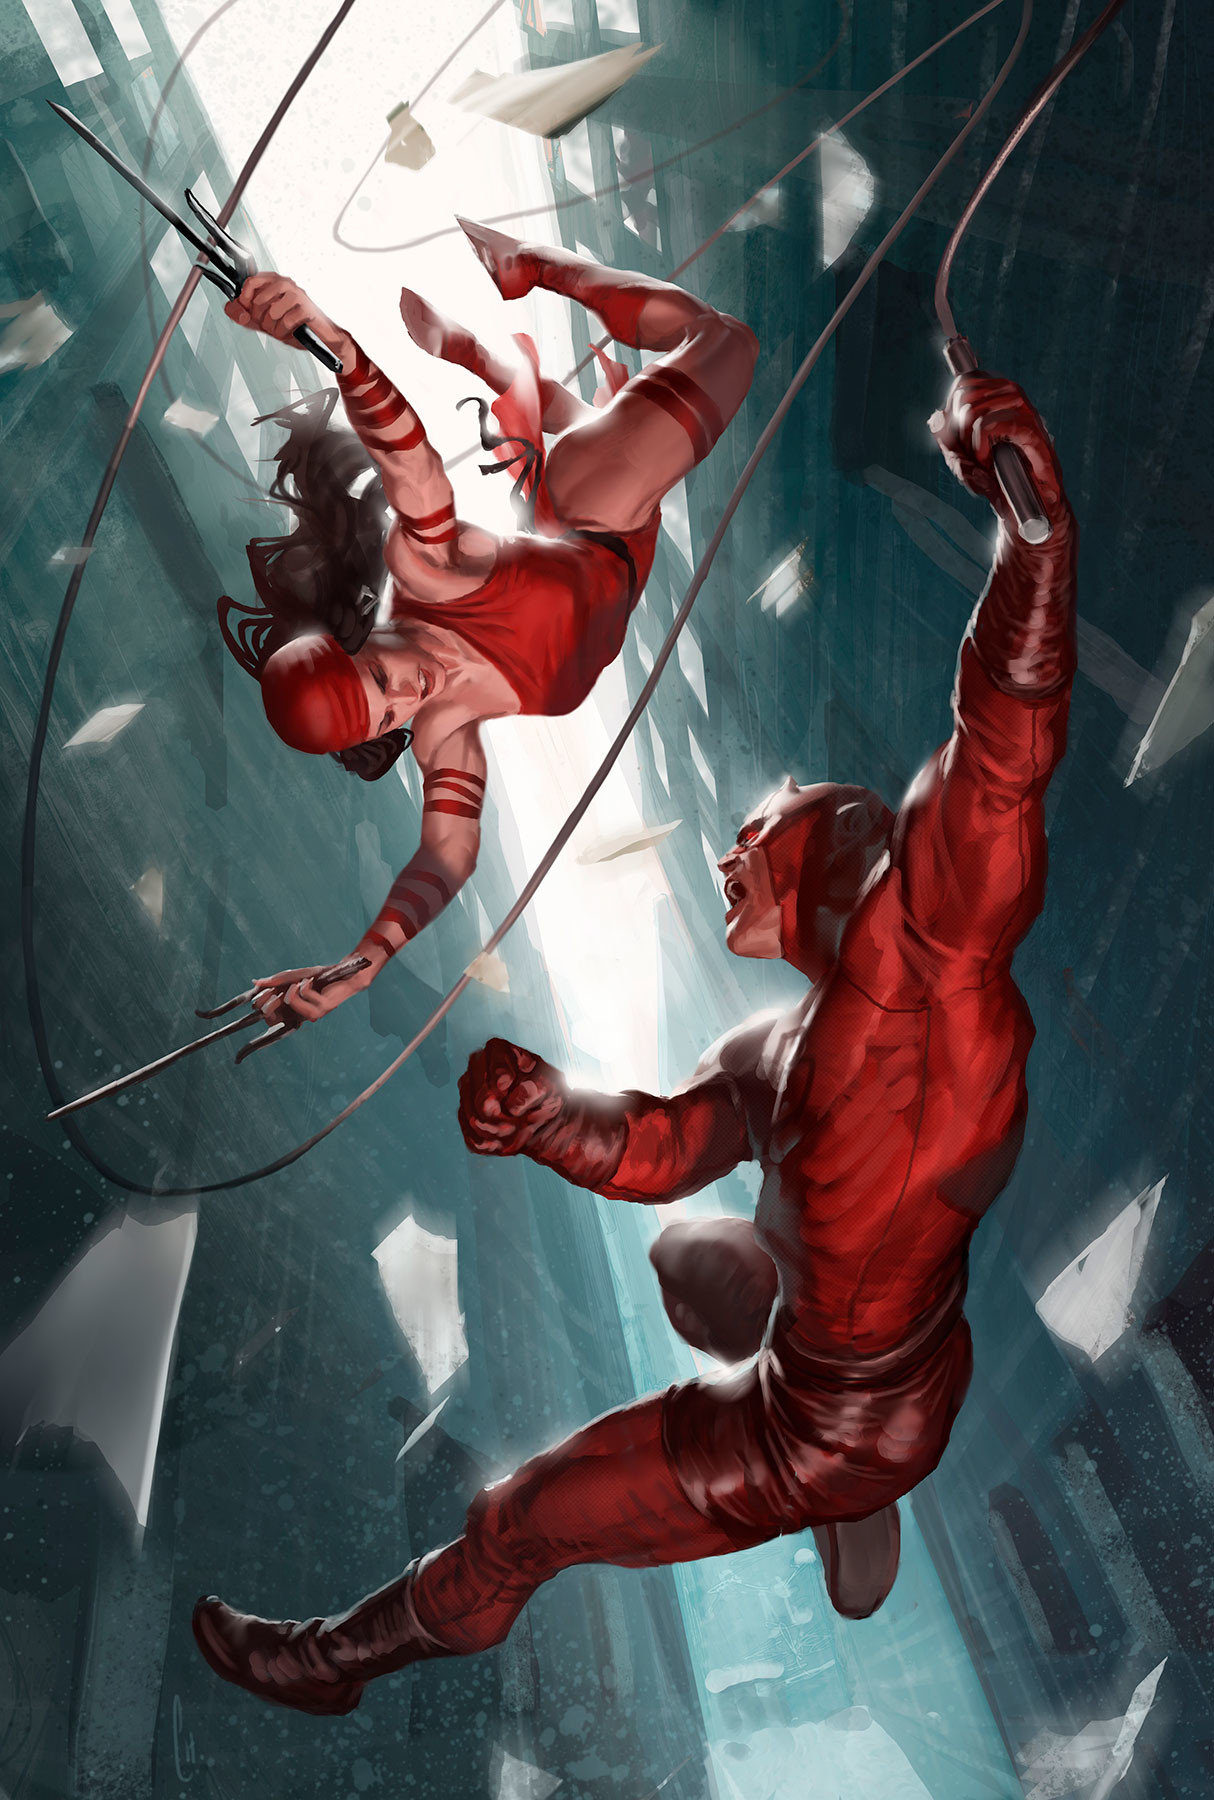 ArtStation - Daredevil and Elektra, Javier Charro